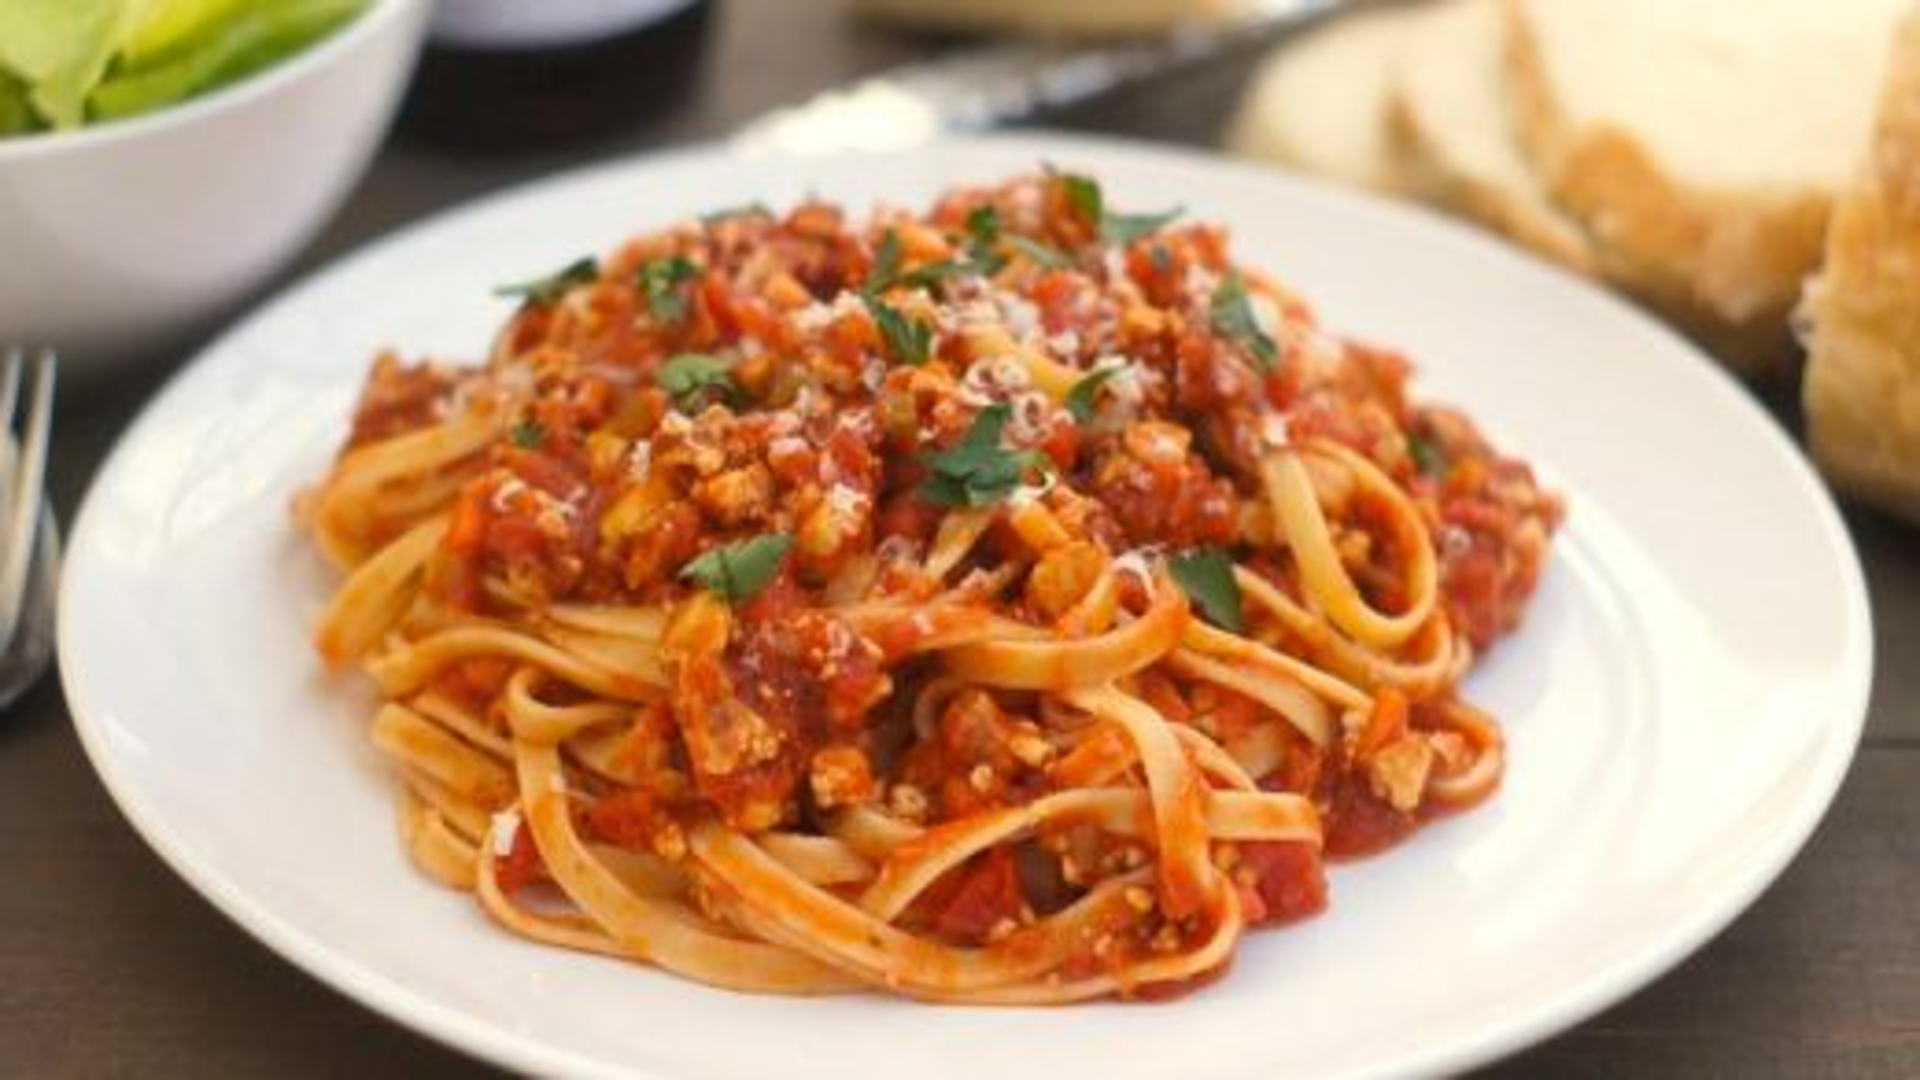 اسپاگتی توفو | تگ